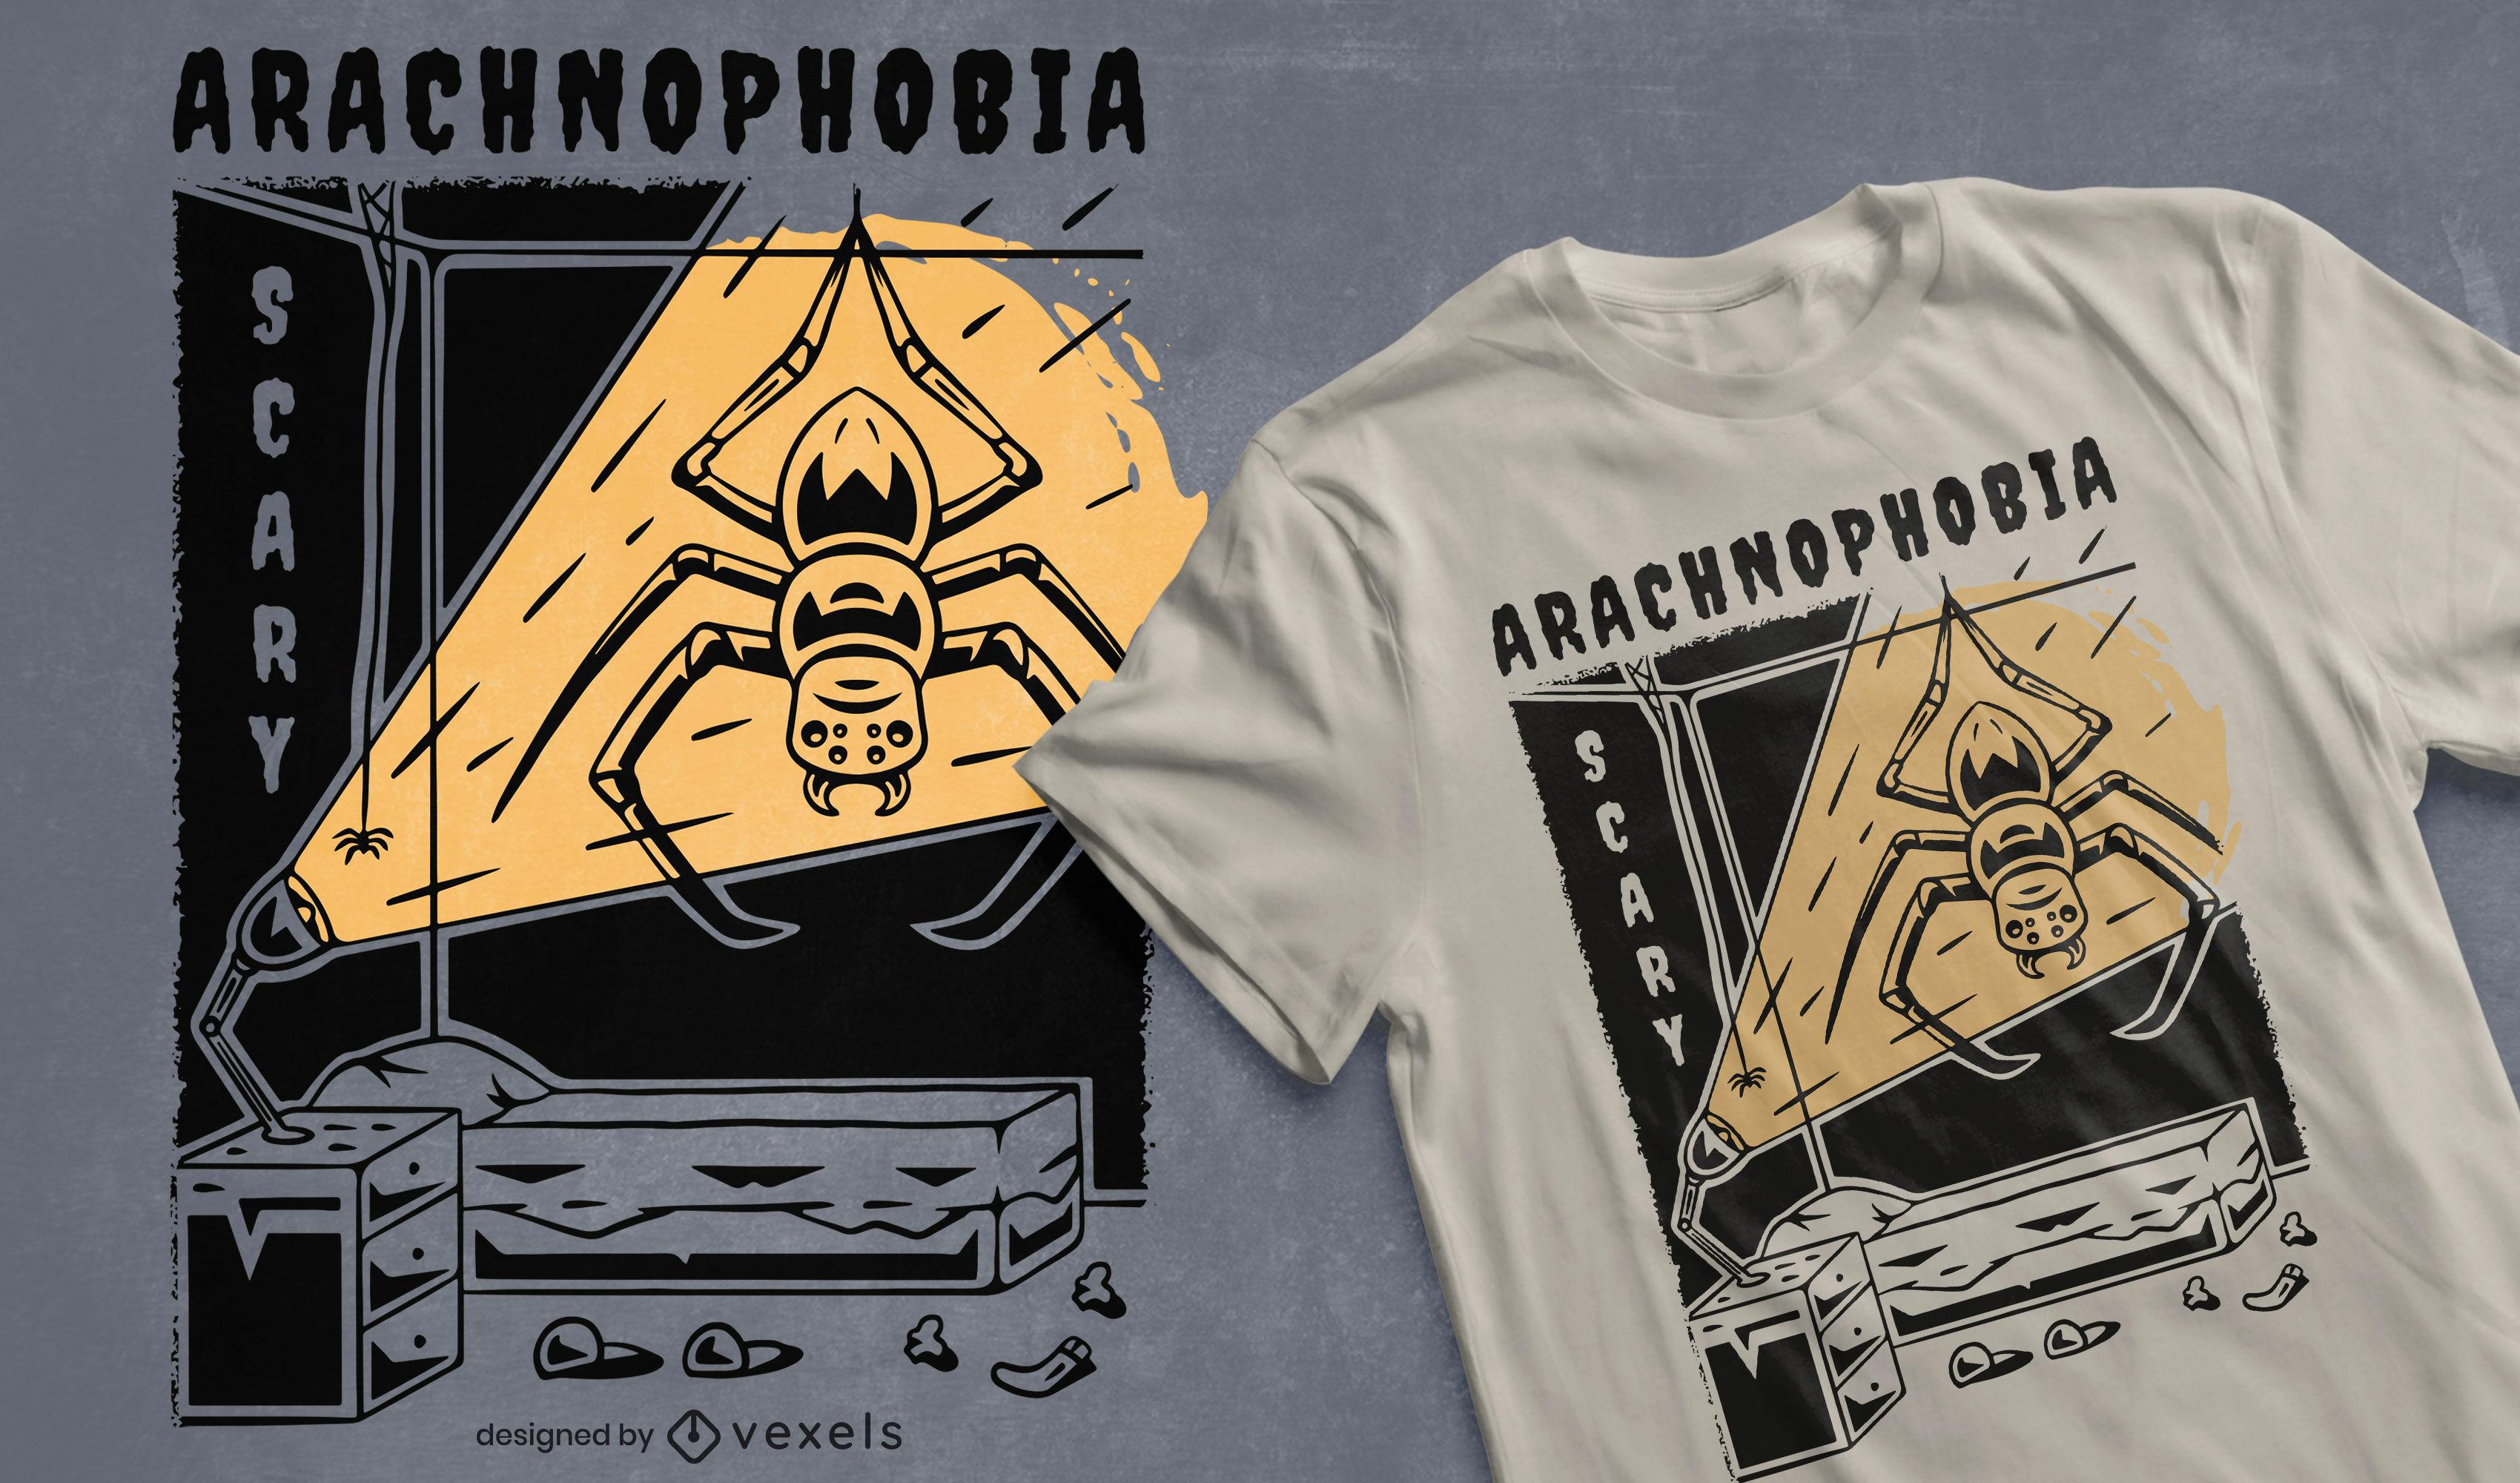 Creepy Arachnophobia t-shirt design